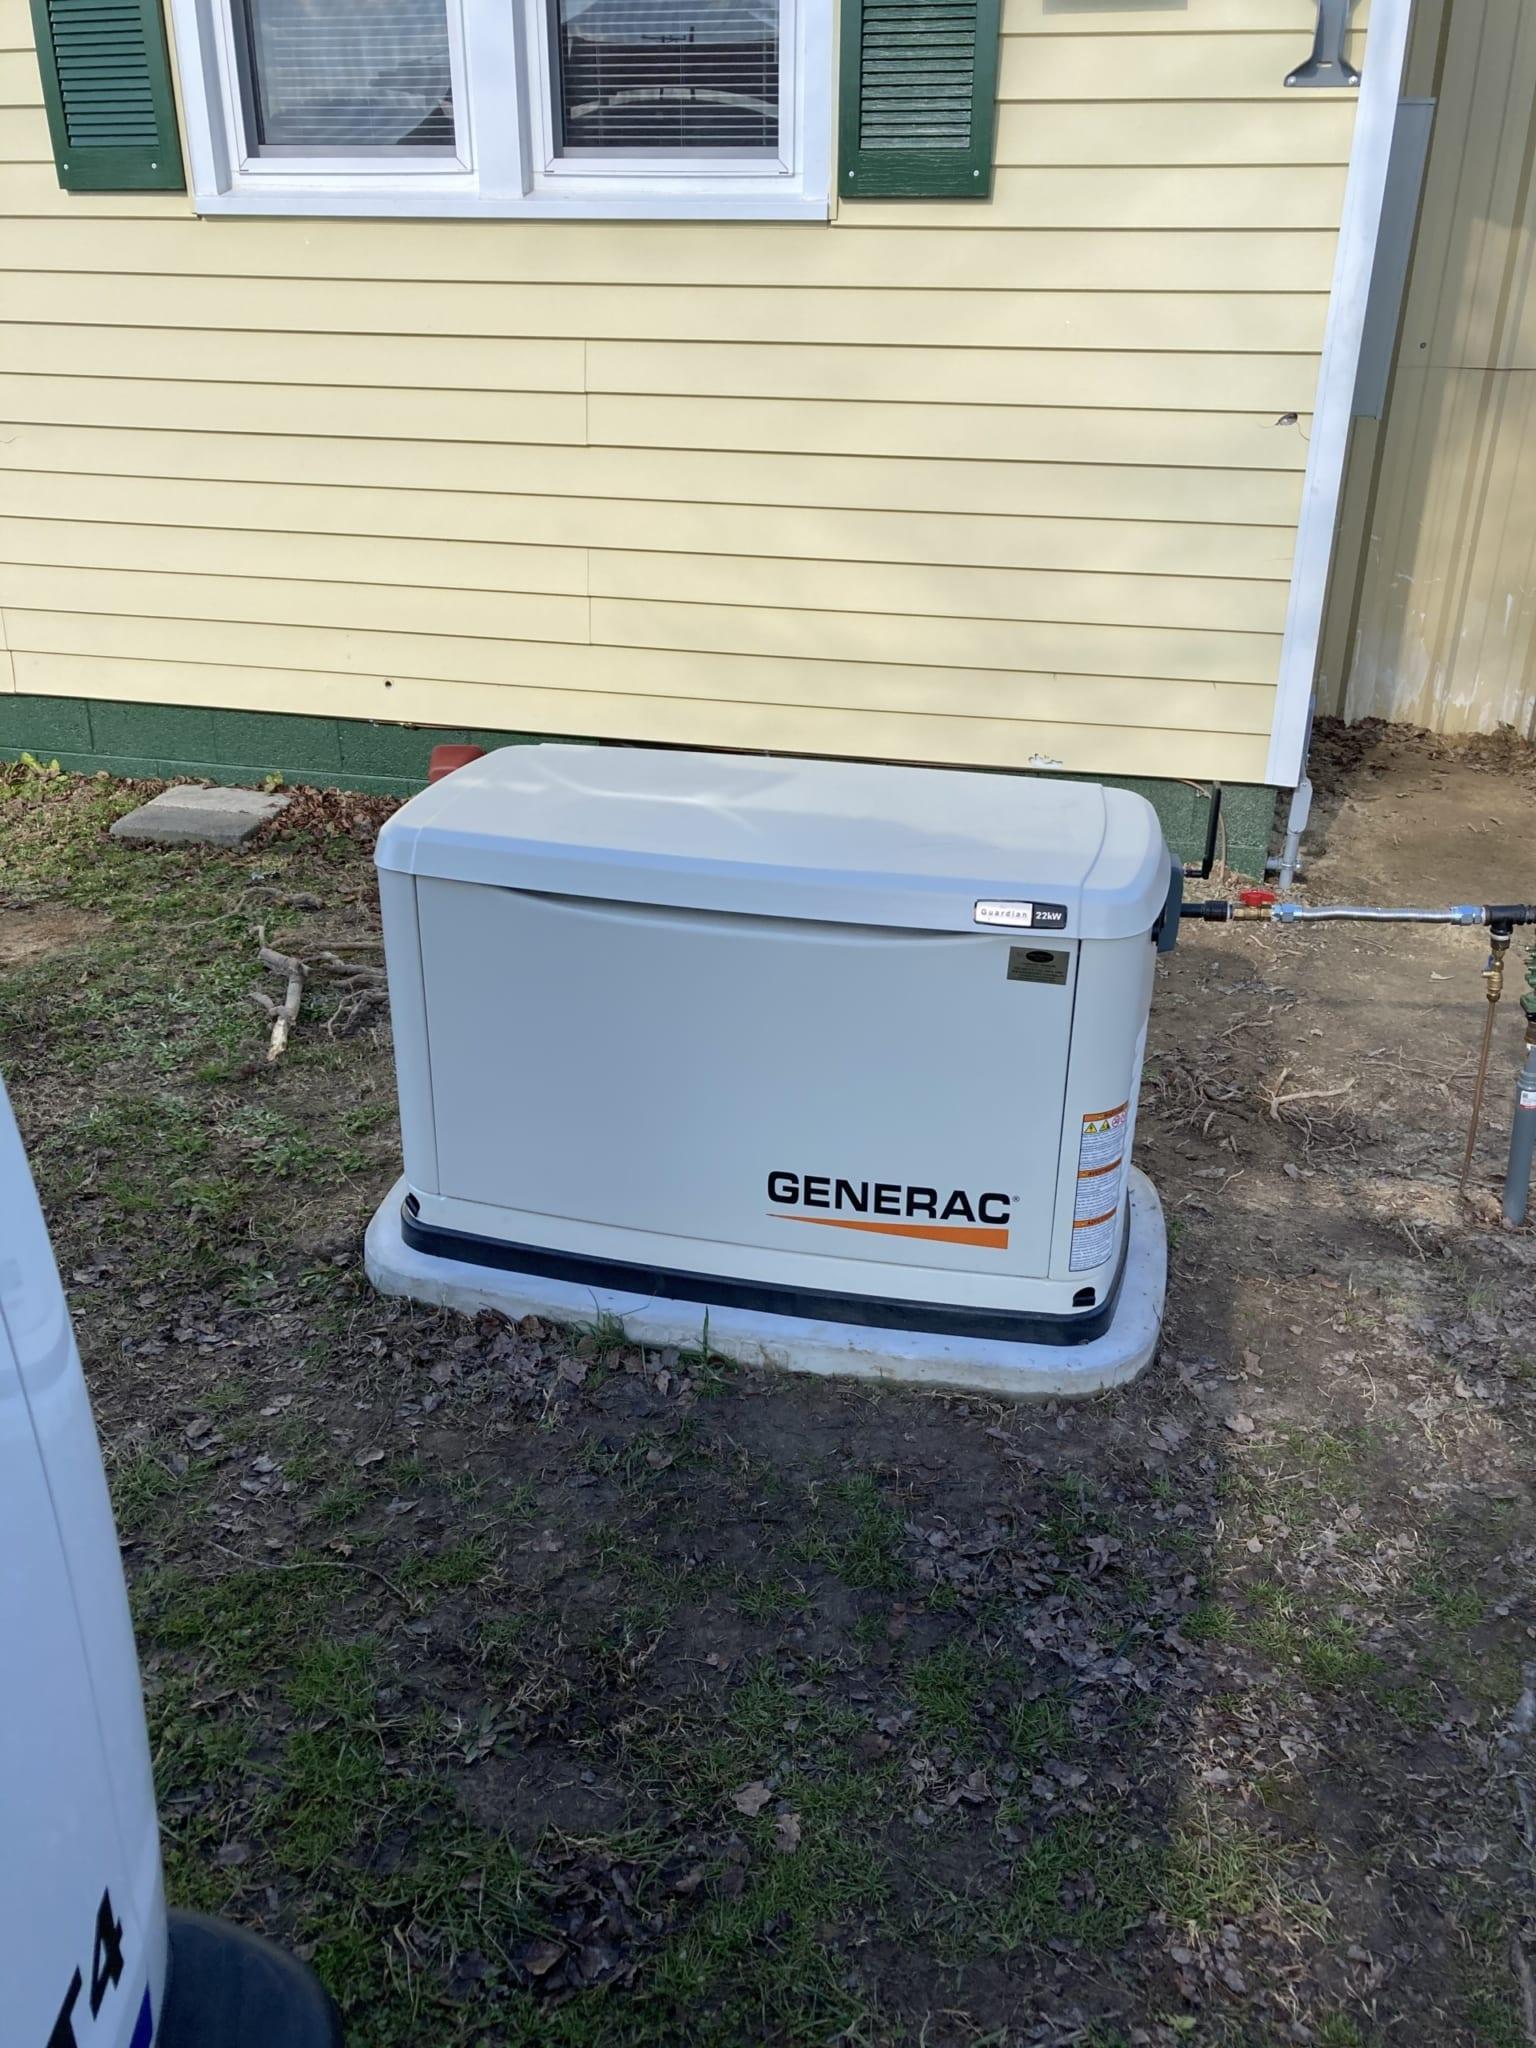 1.7.21 Lunenburg Generac Automatic Standby Generator